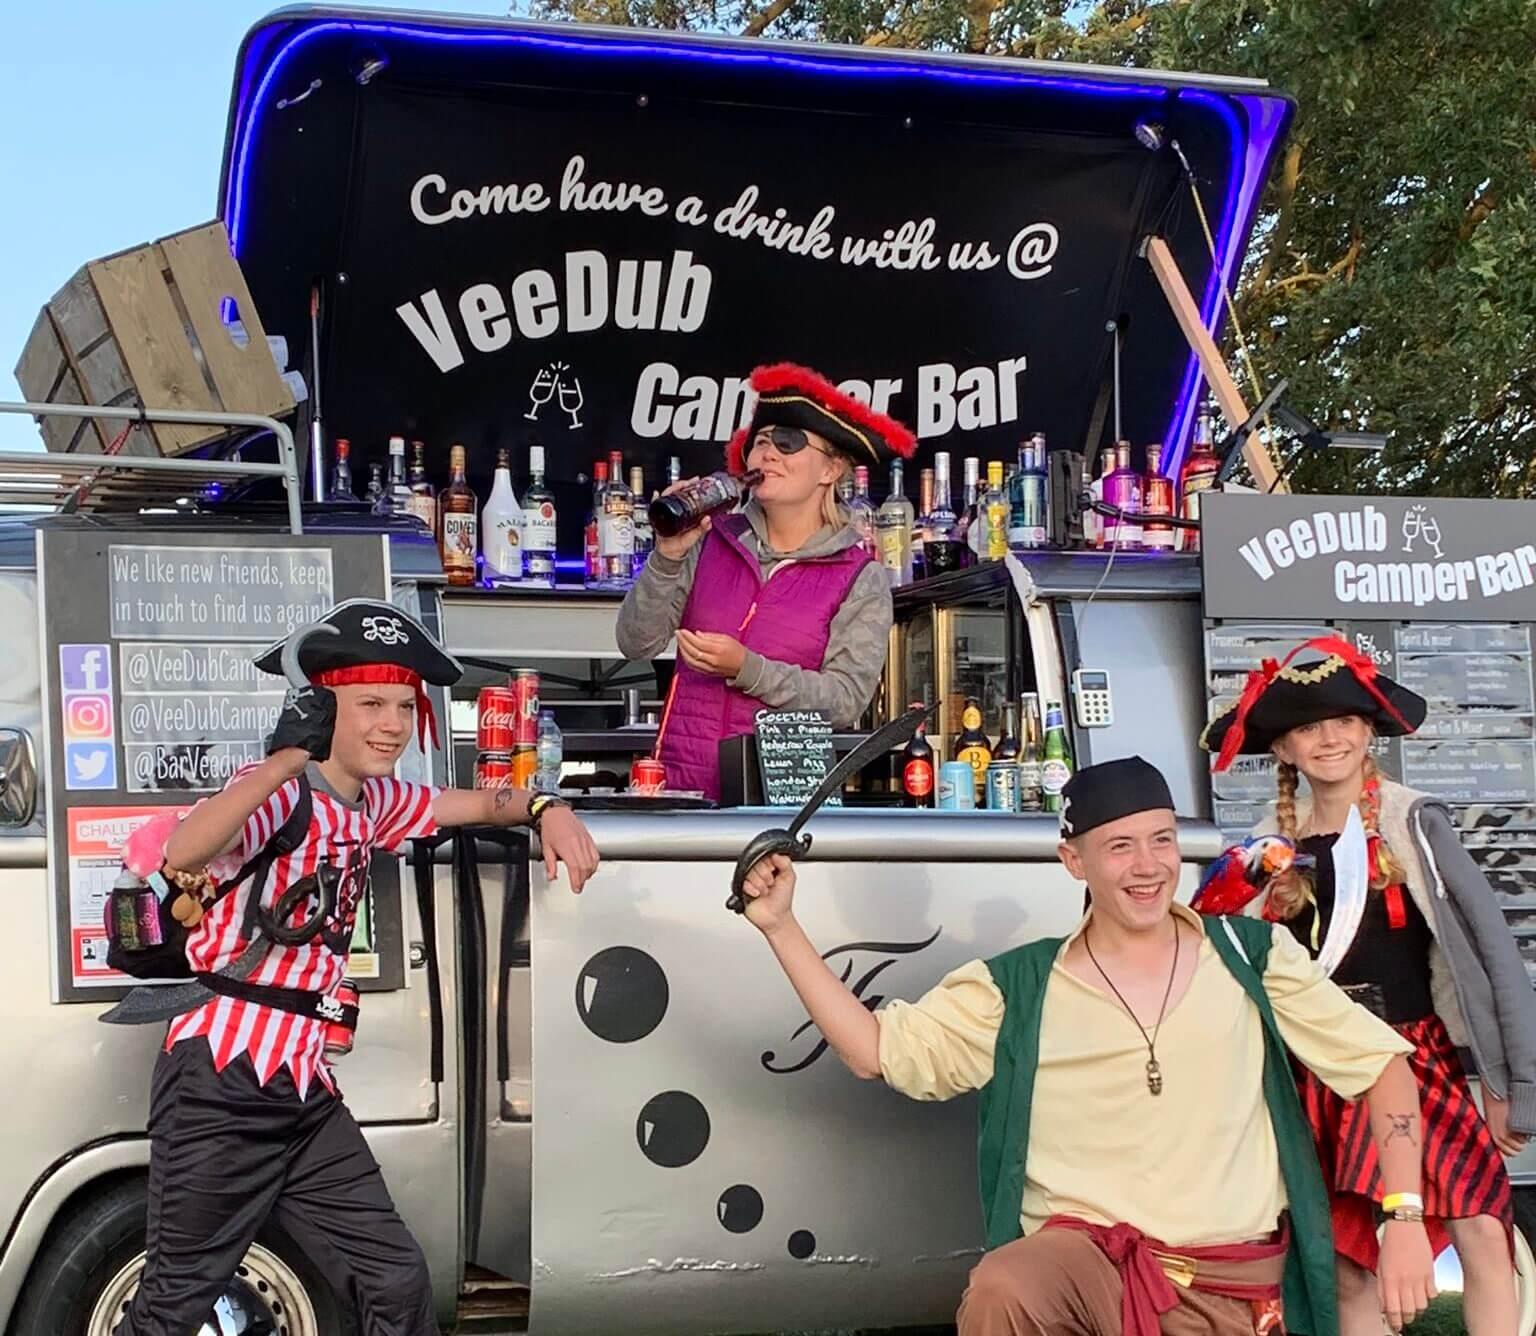 Weddings - Festival Theme - Corporate Event - Mobile Bar